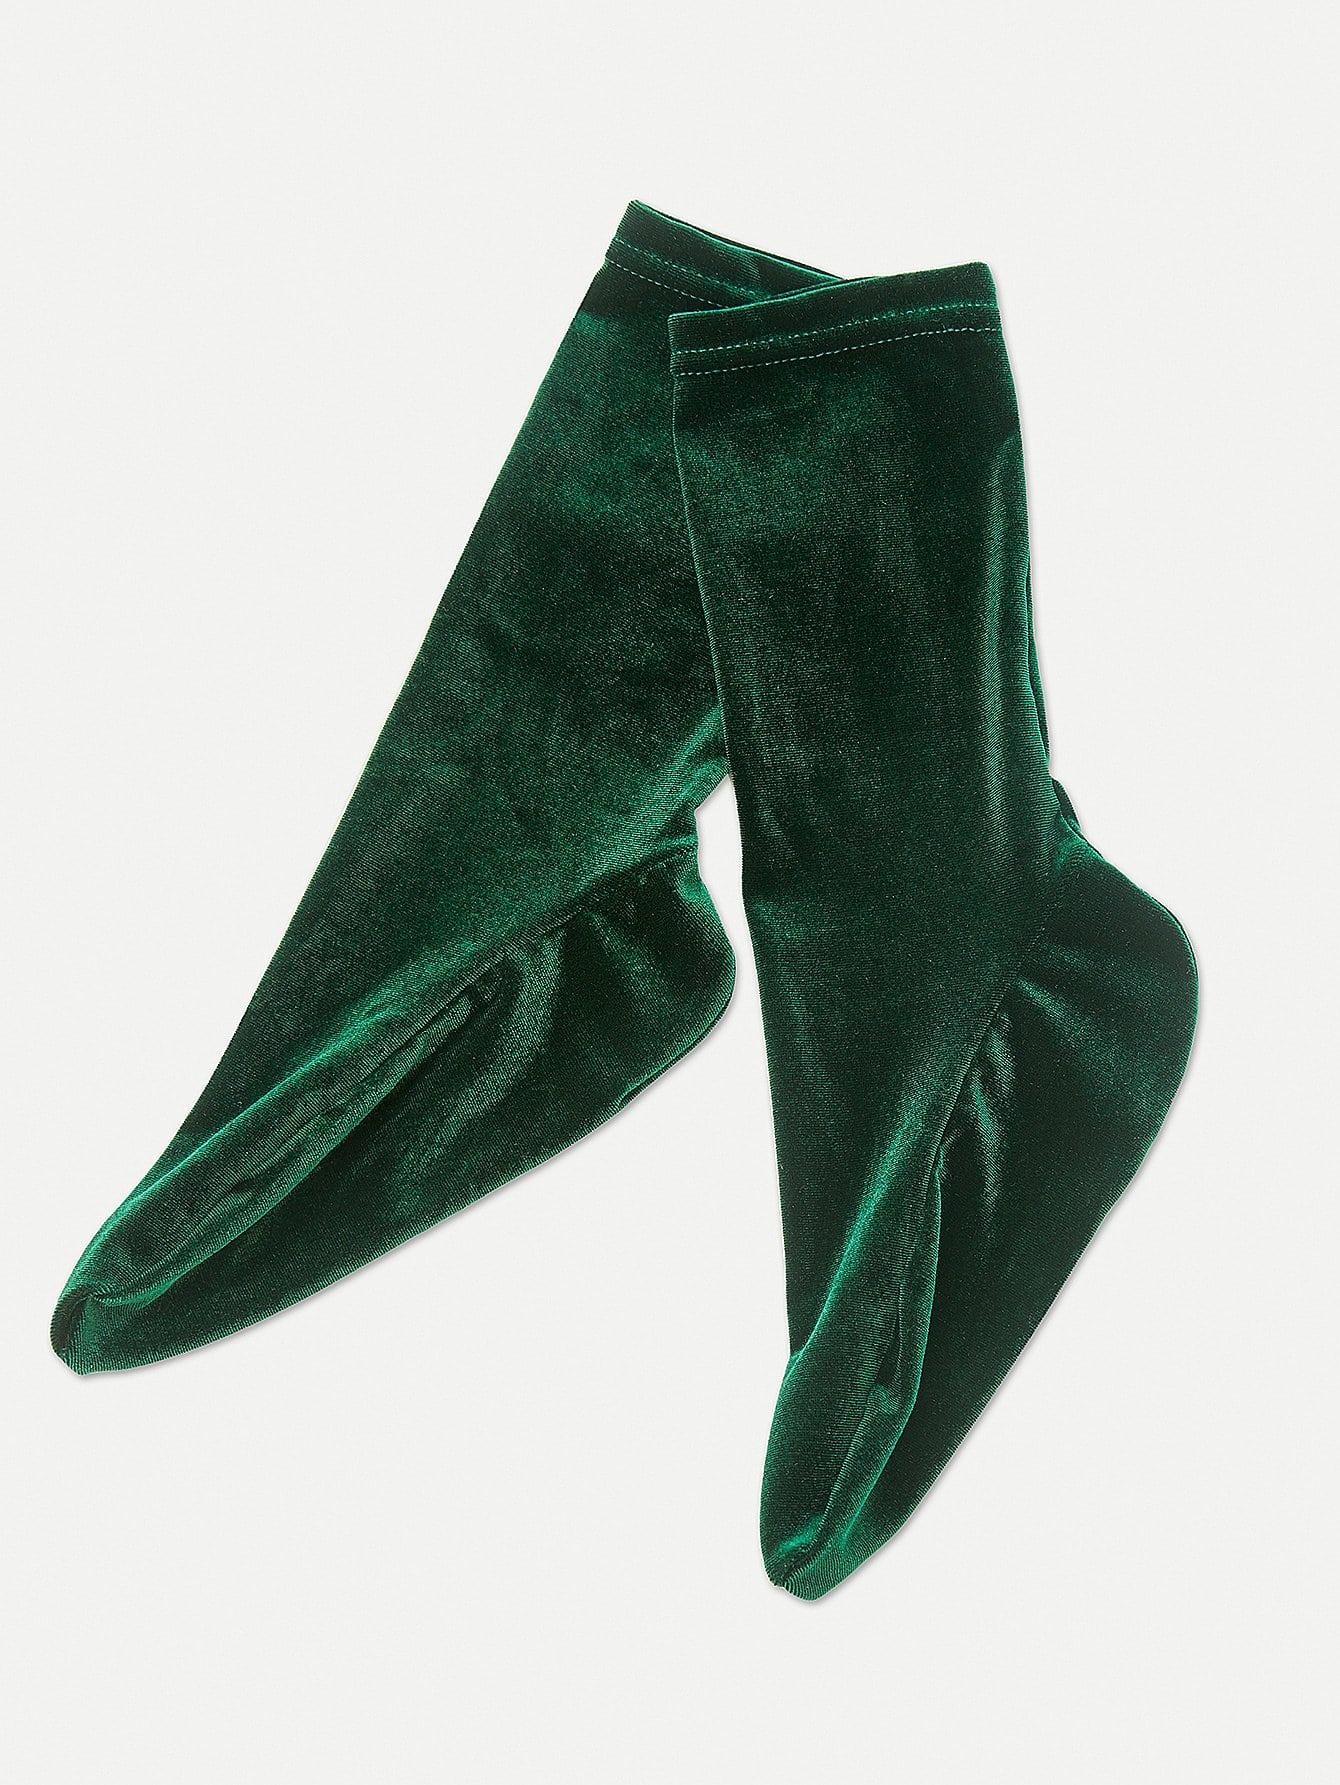 Einfache Socken 1Paar